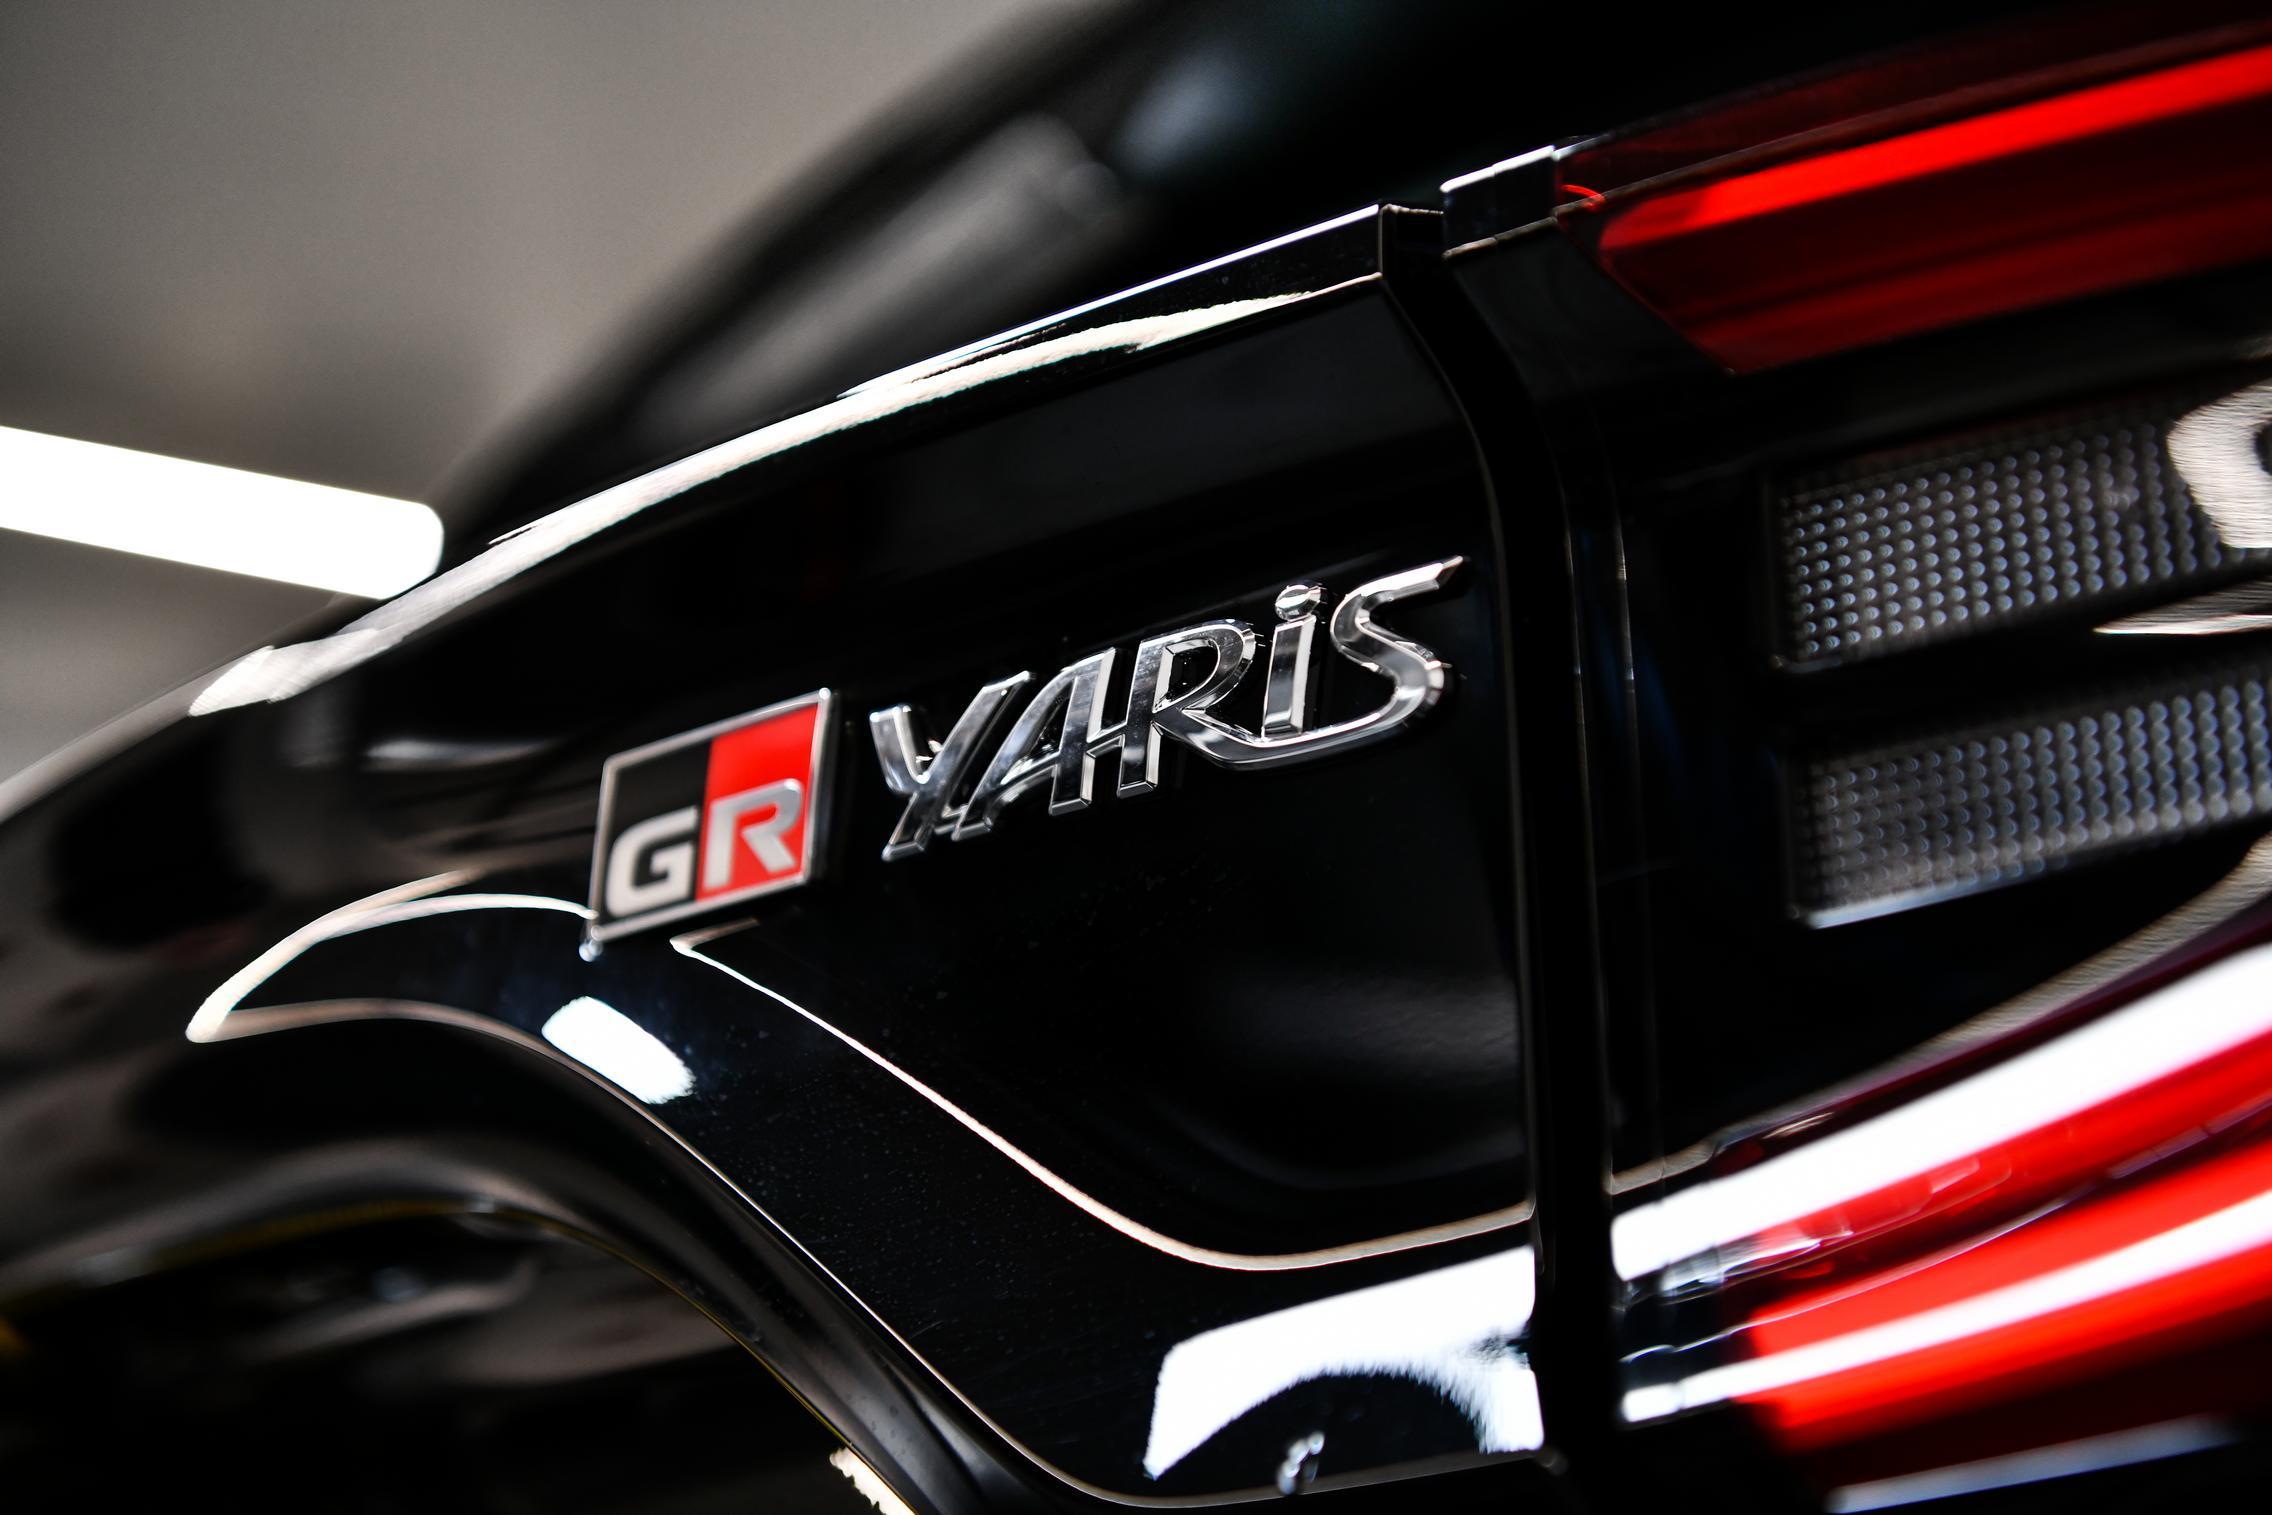 GR Yaris Badge